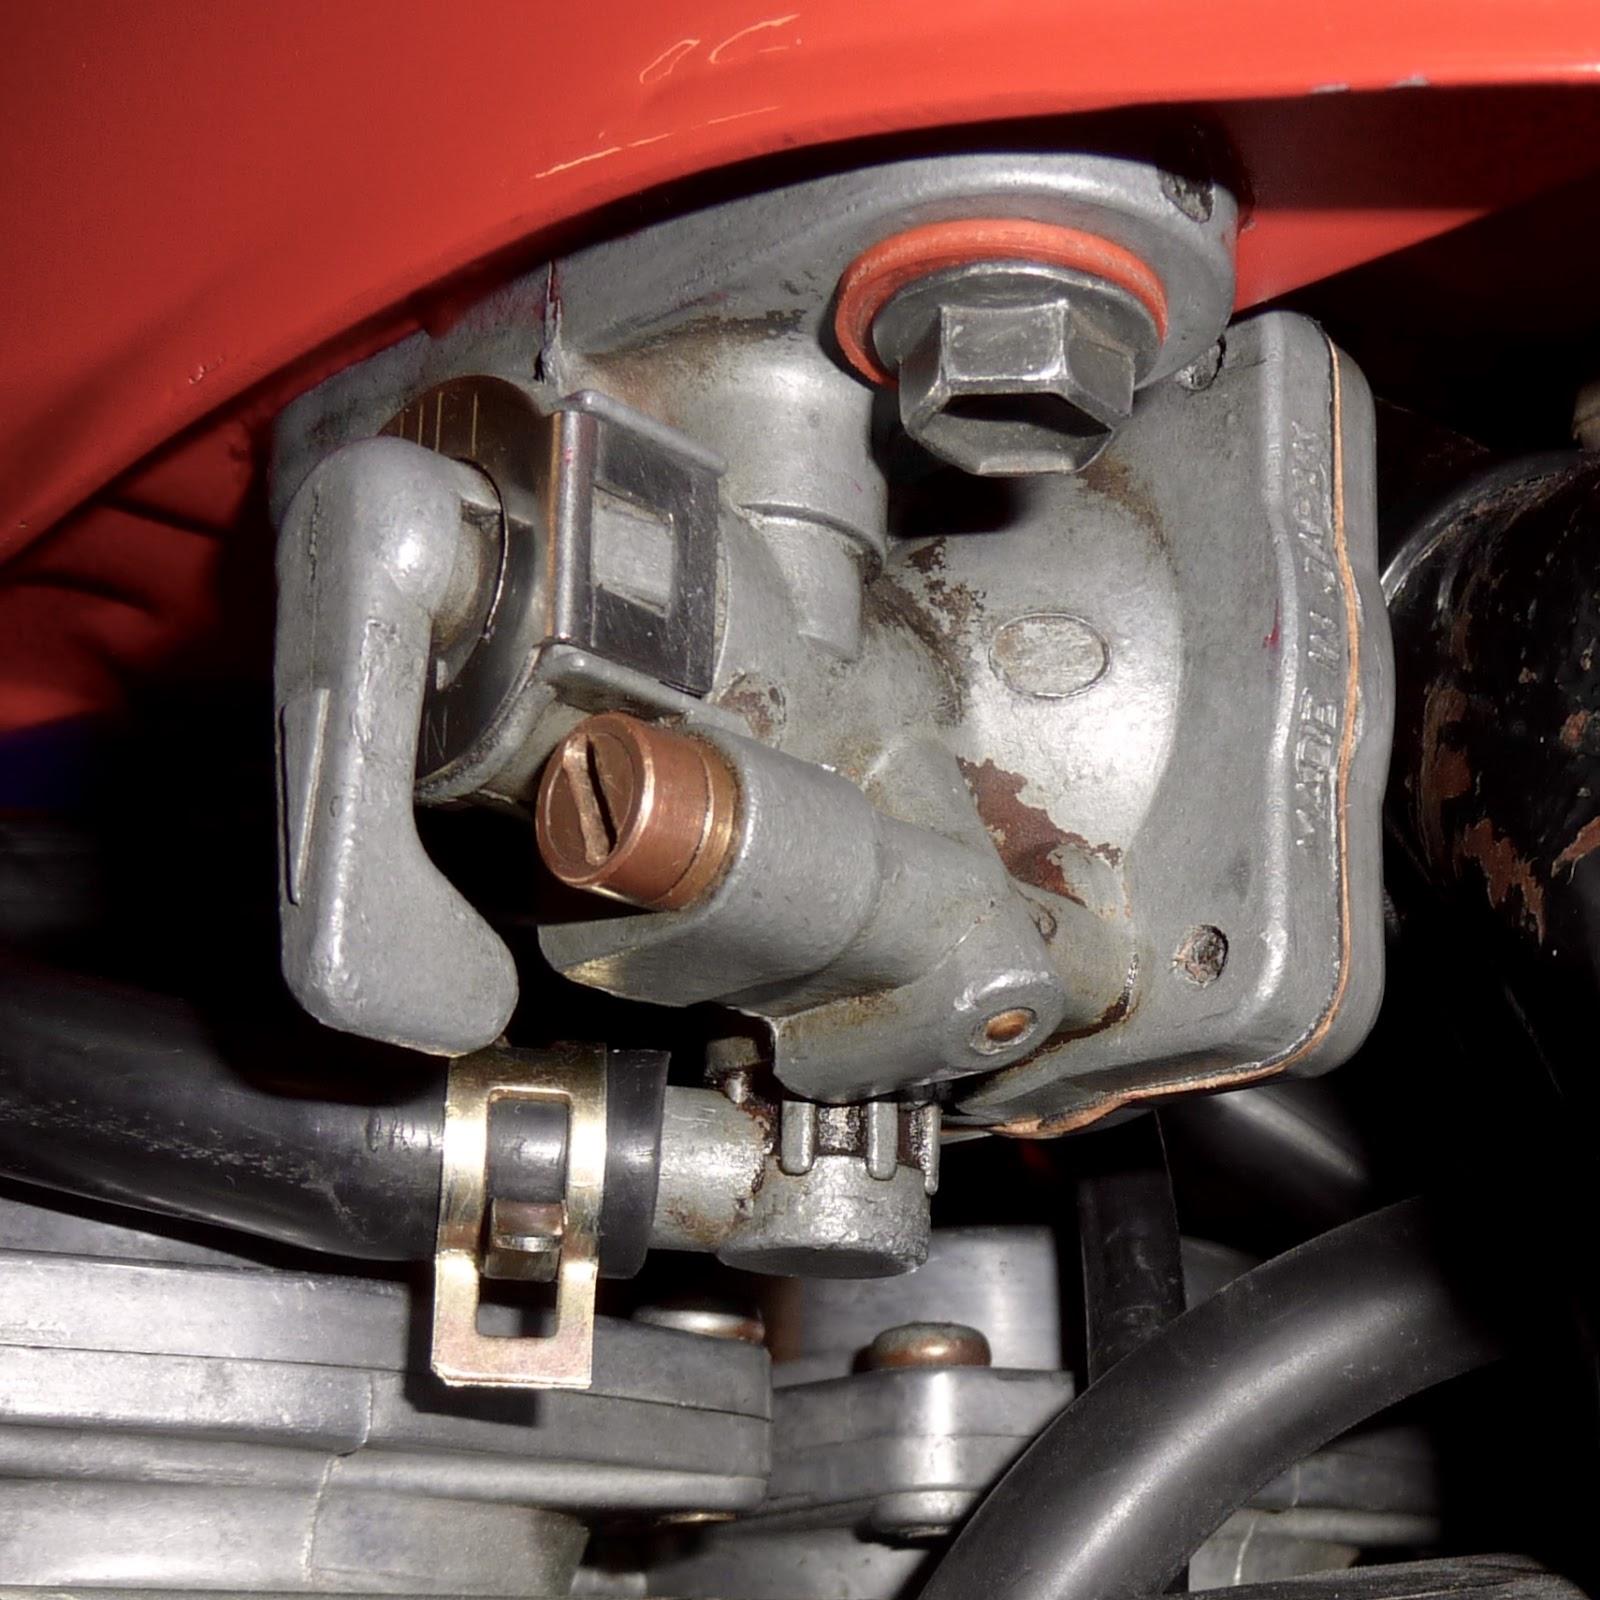 BikeTech7: Suzuki GS550 Petrol Tap Overhaul